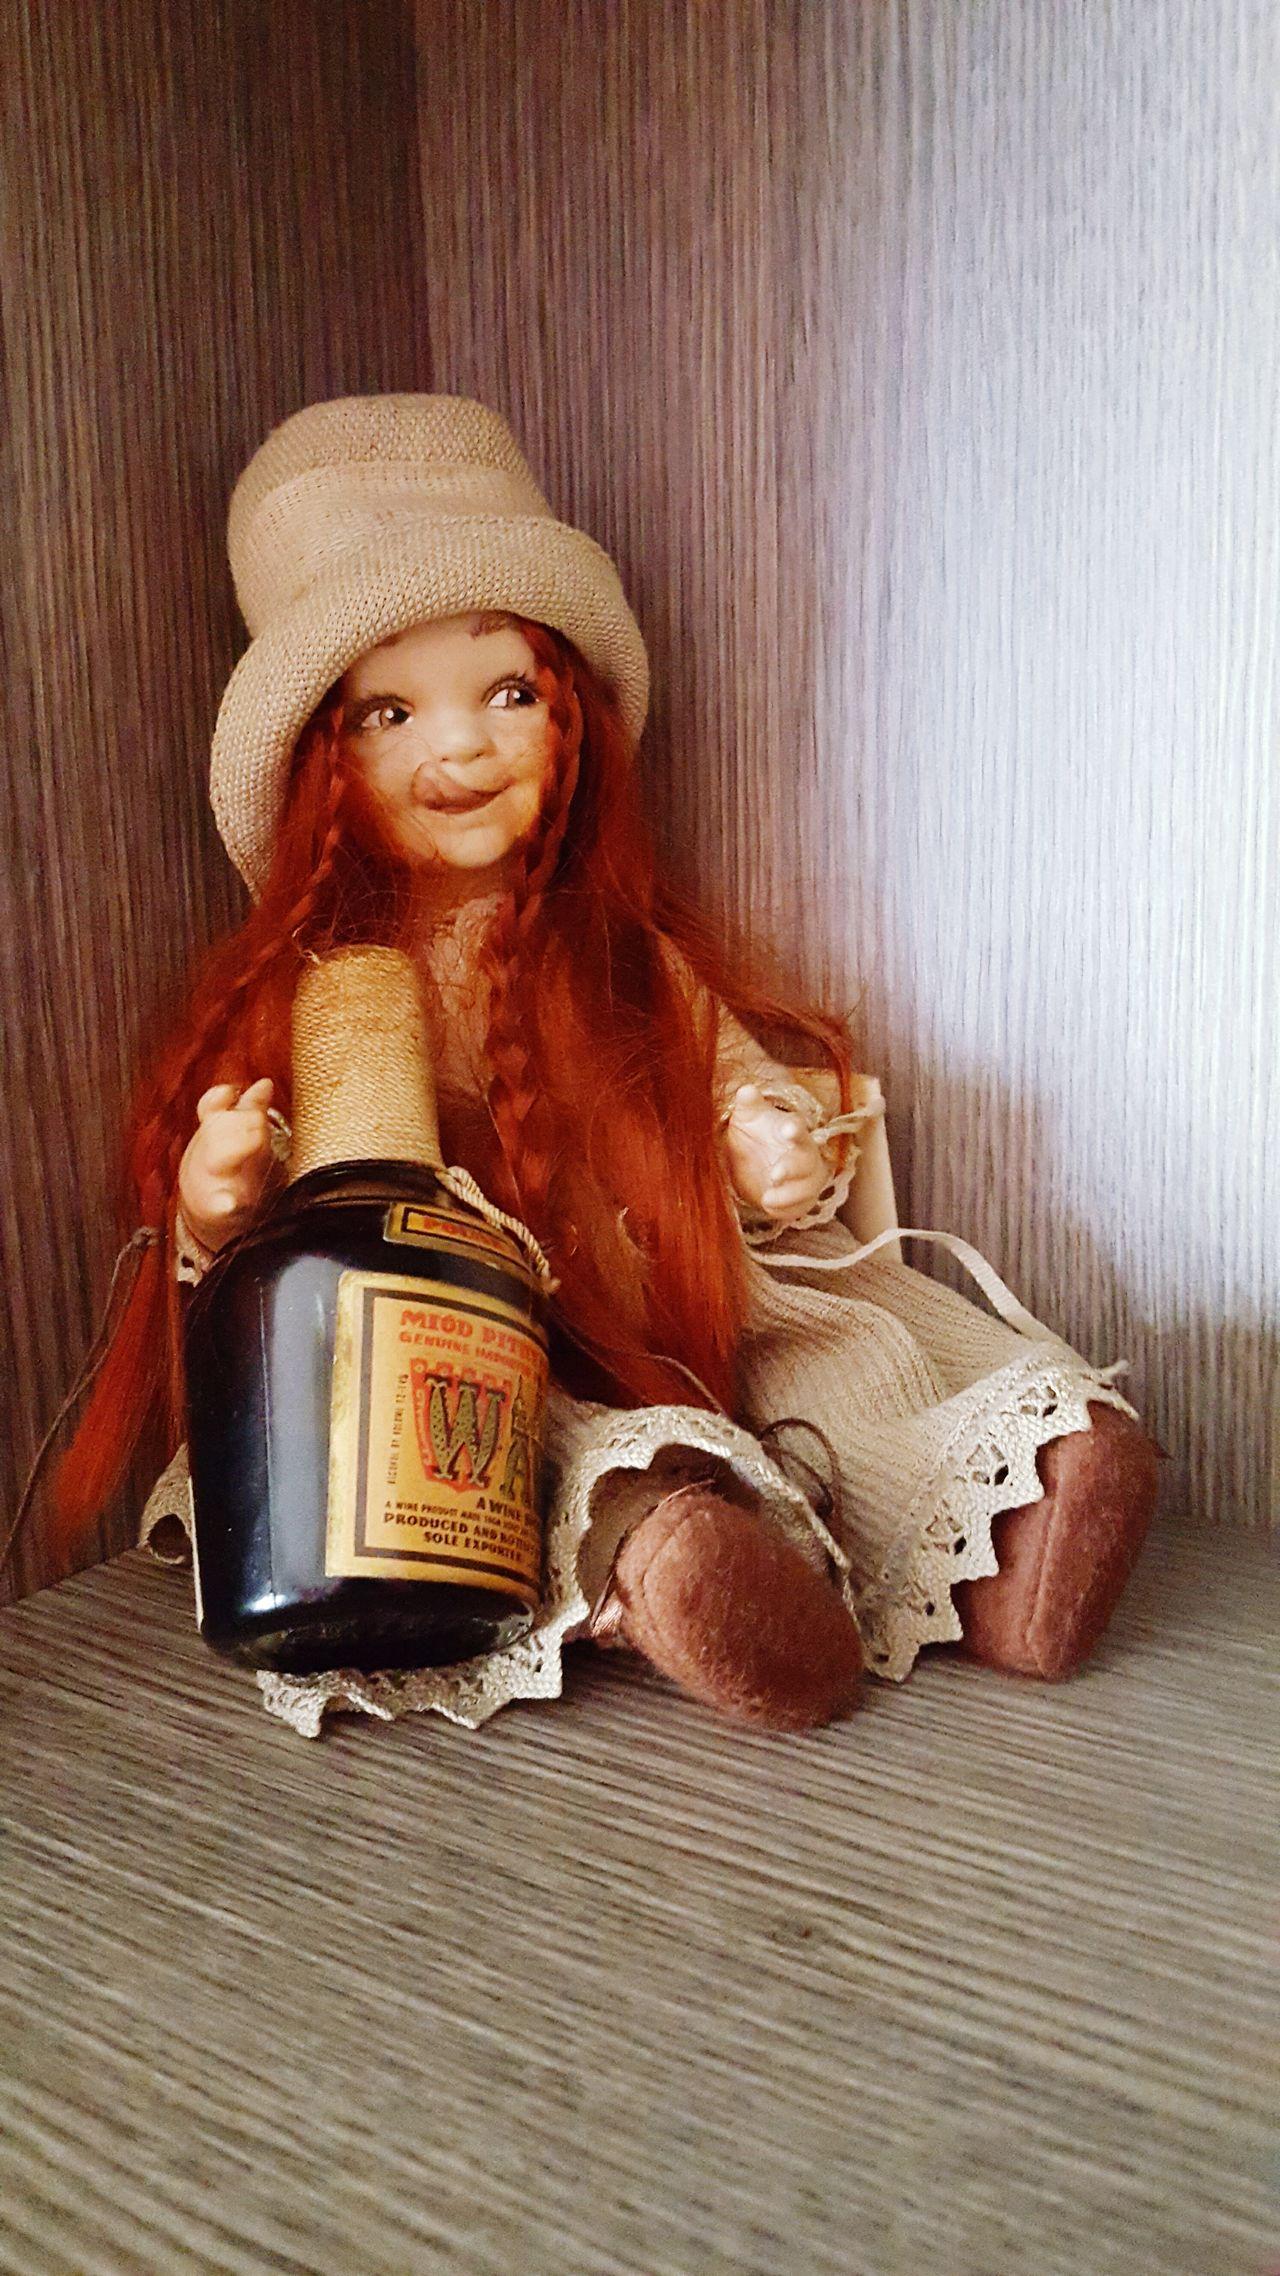 Drunken Doll Drunk Doll Photography Dolly Redhead Red Hair Vintage Alcohol Miniature Cute Cute Dolls